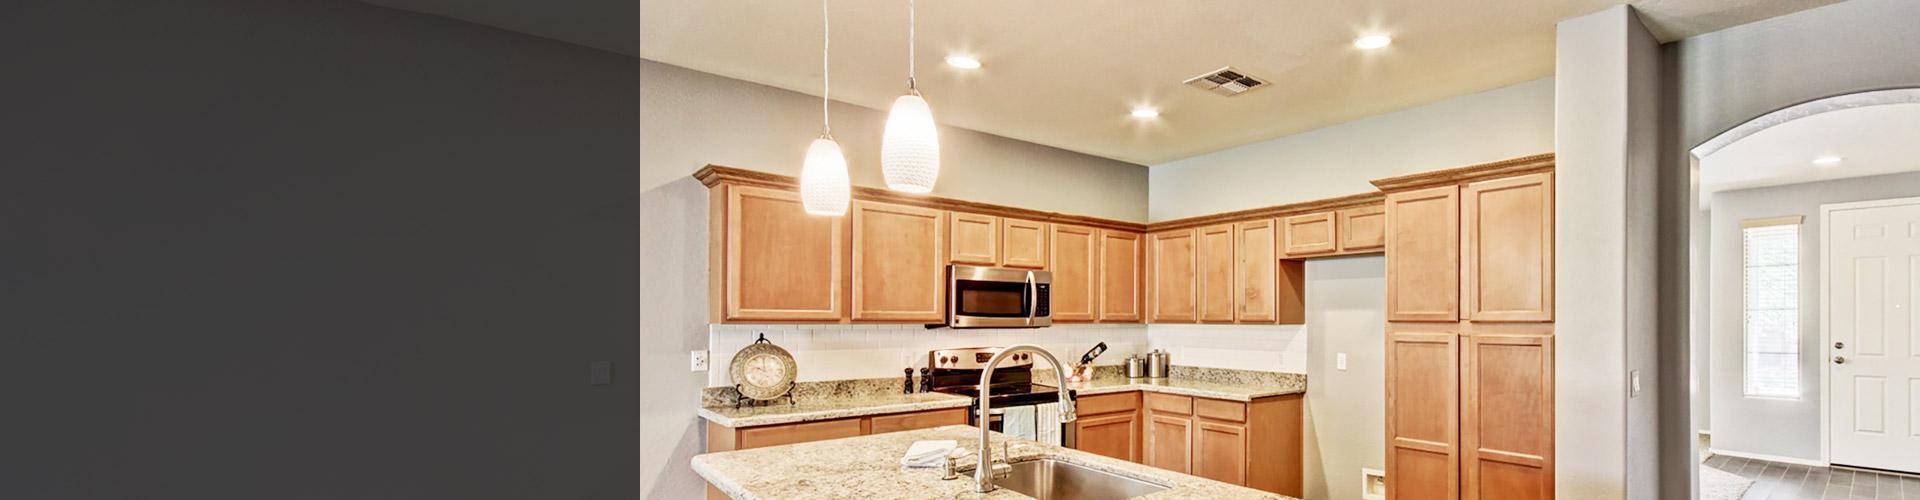 Kitchen Led Recessed Lighting